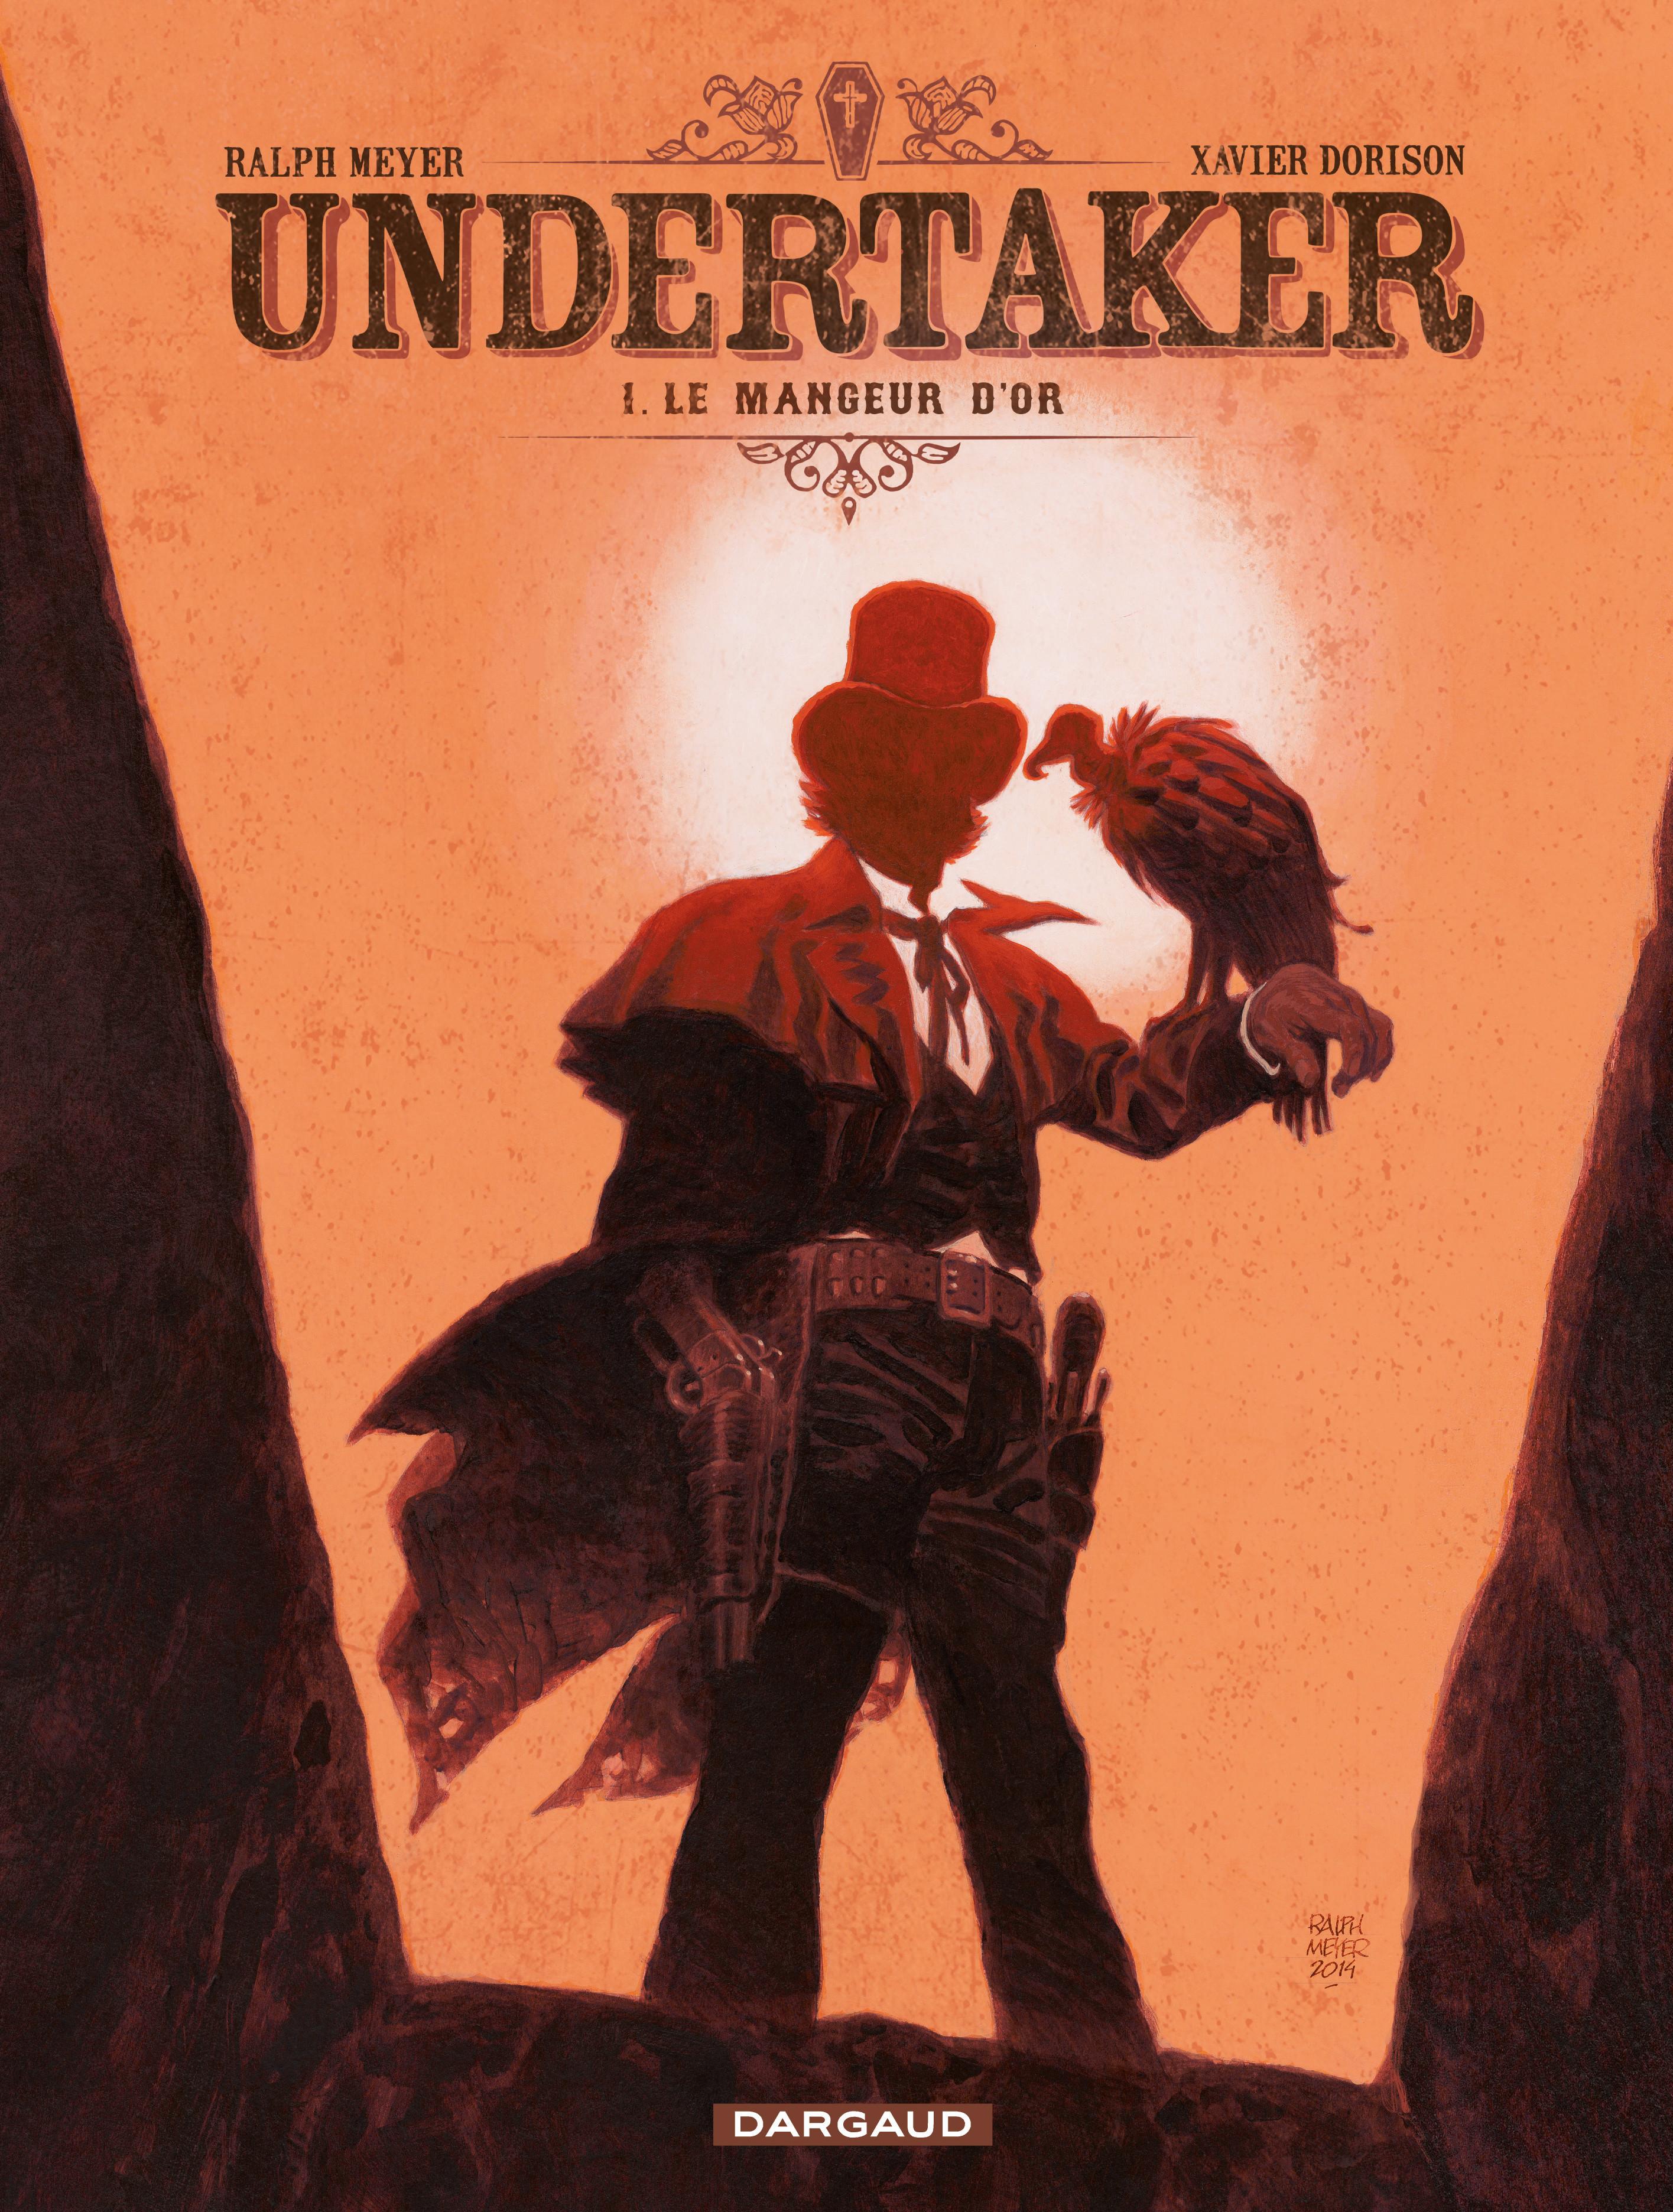 Undertaker - Tome 1 - Le Mangeur d'or